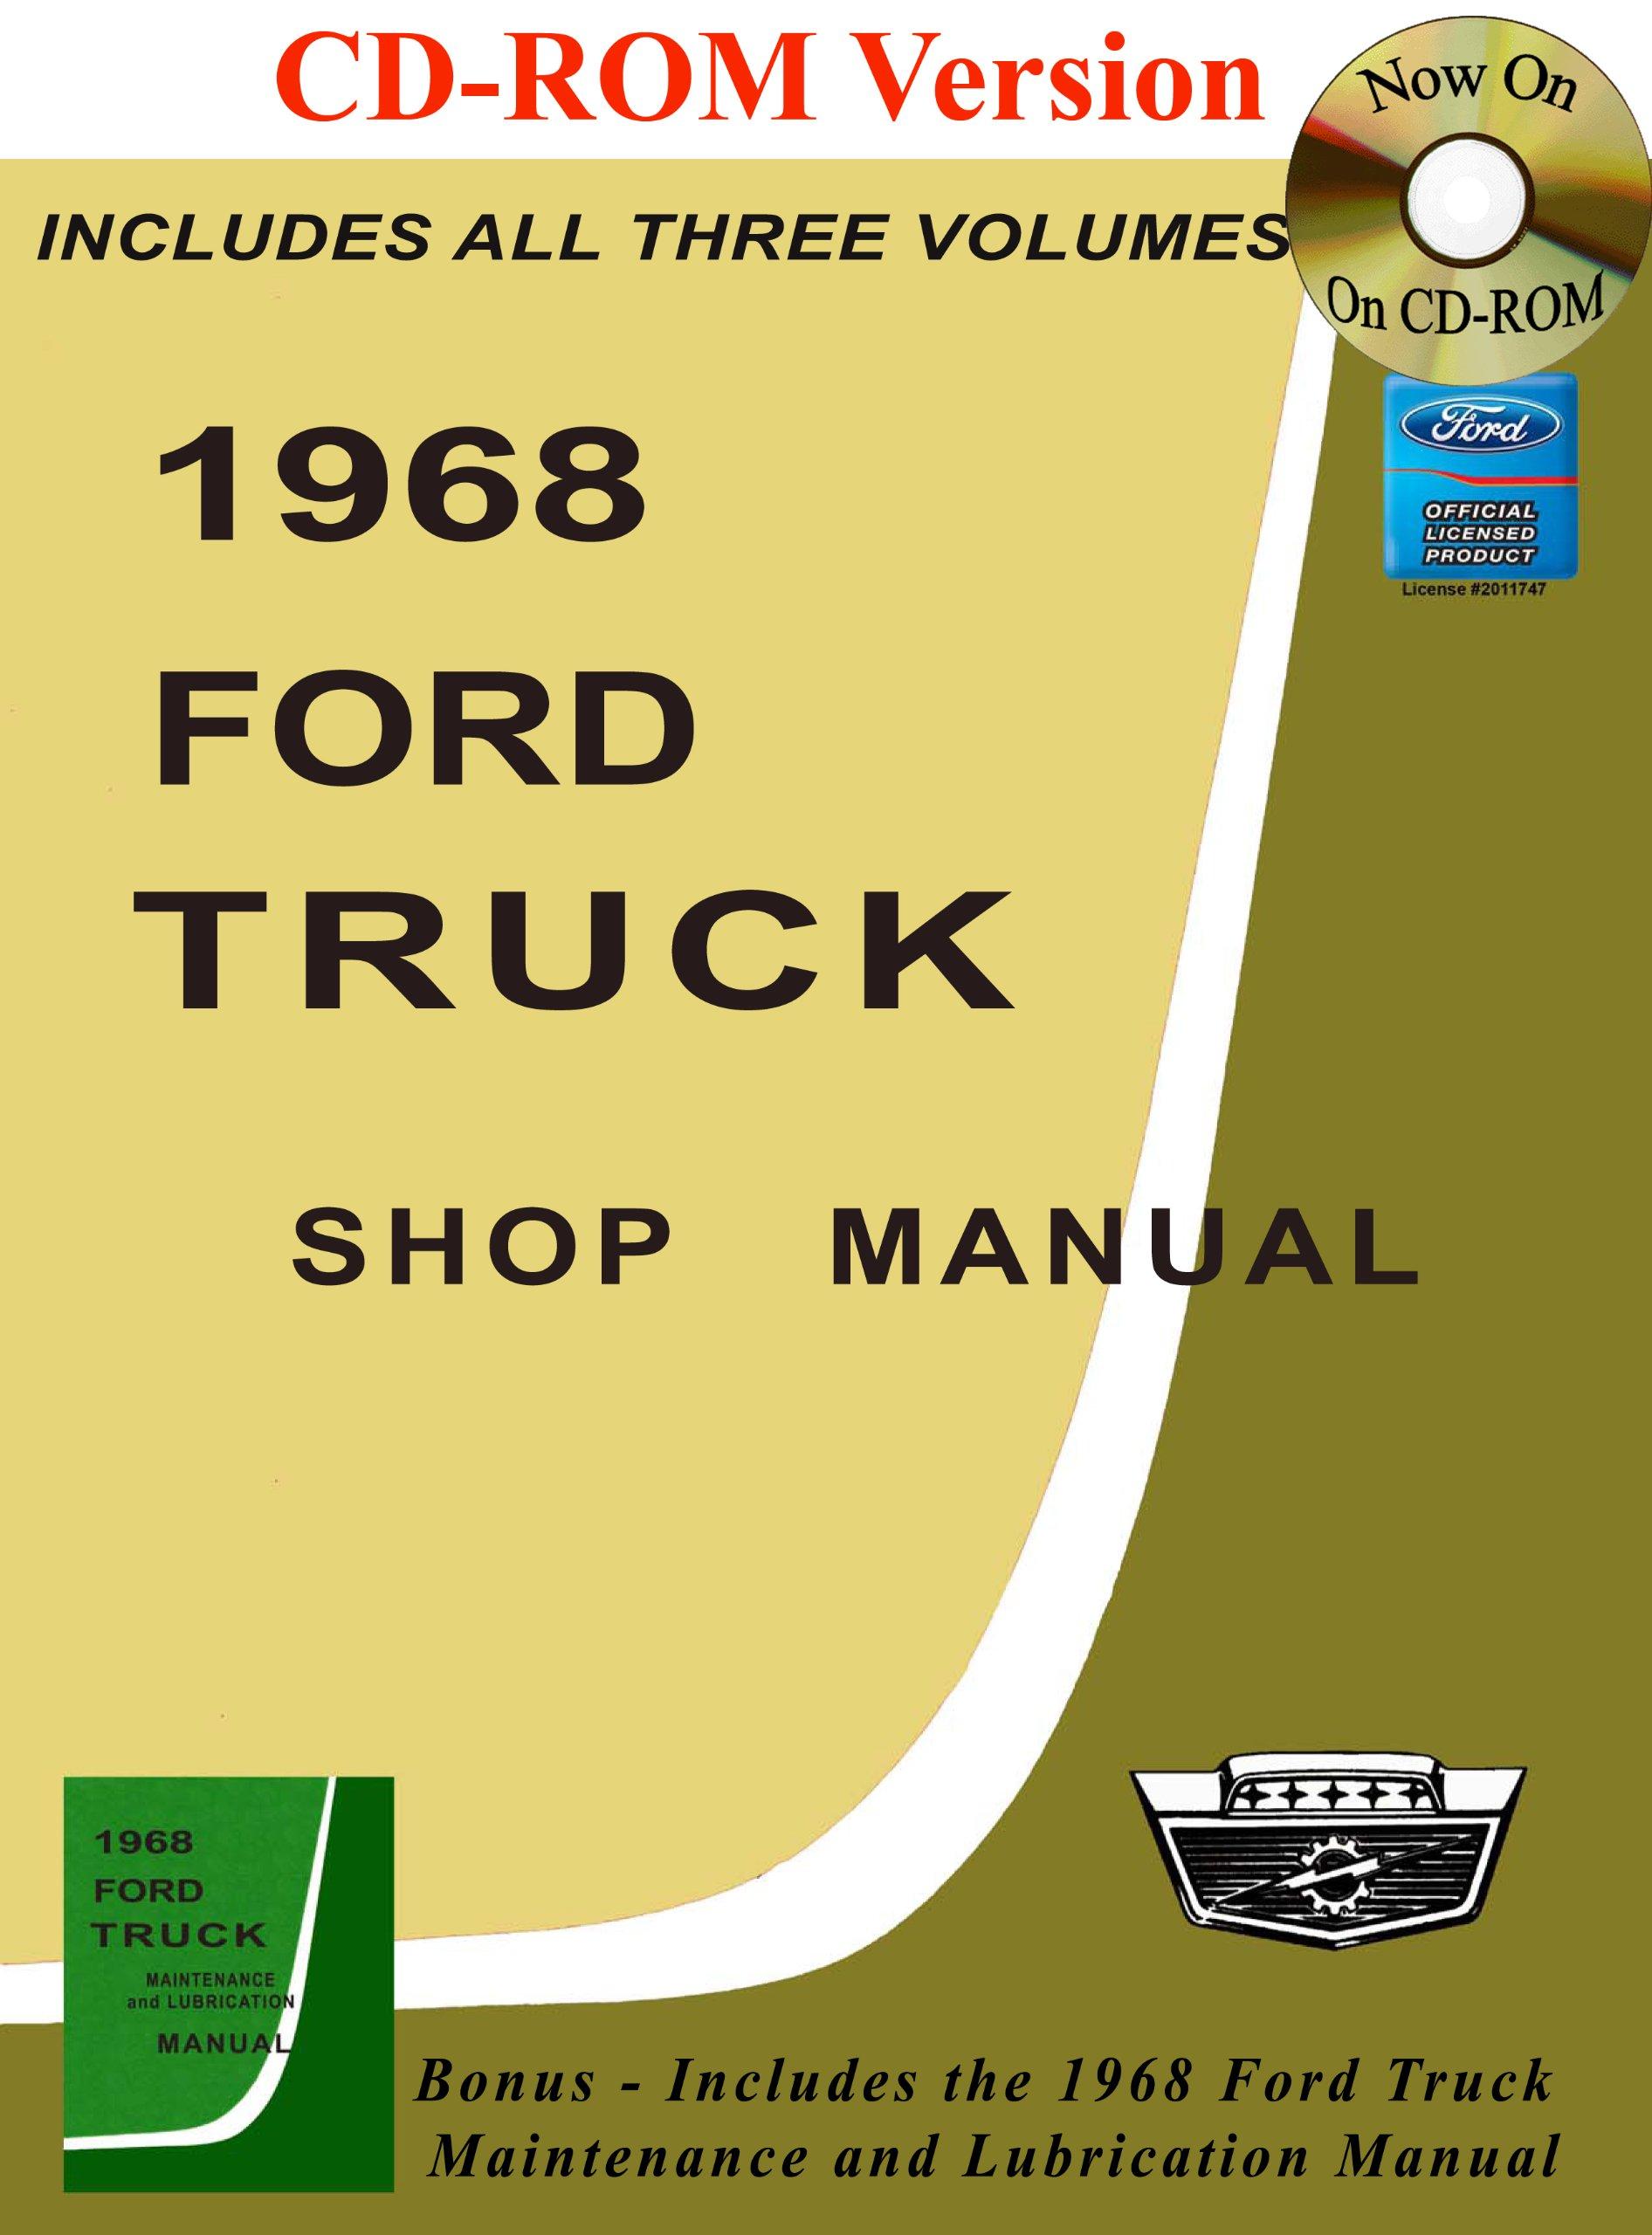 1968 Ford Truck Shop Manual: Ford Motor Company, David E. LeBlanc:  9781603710763: Amazon.com: Books